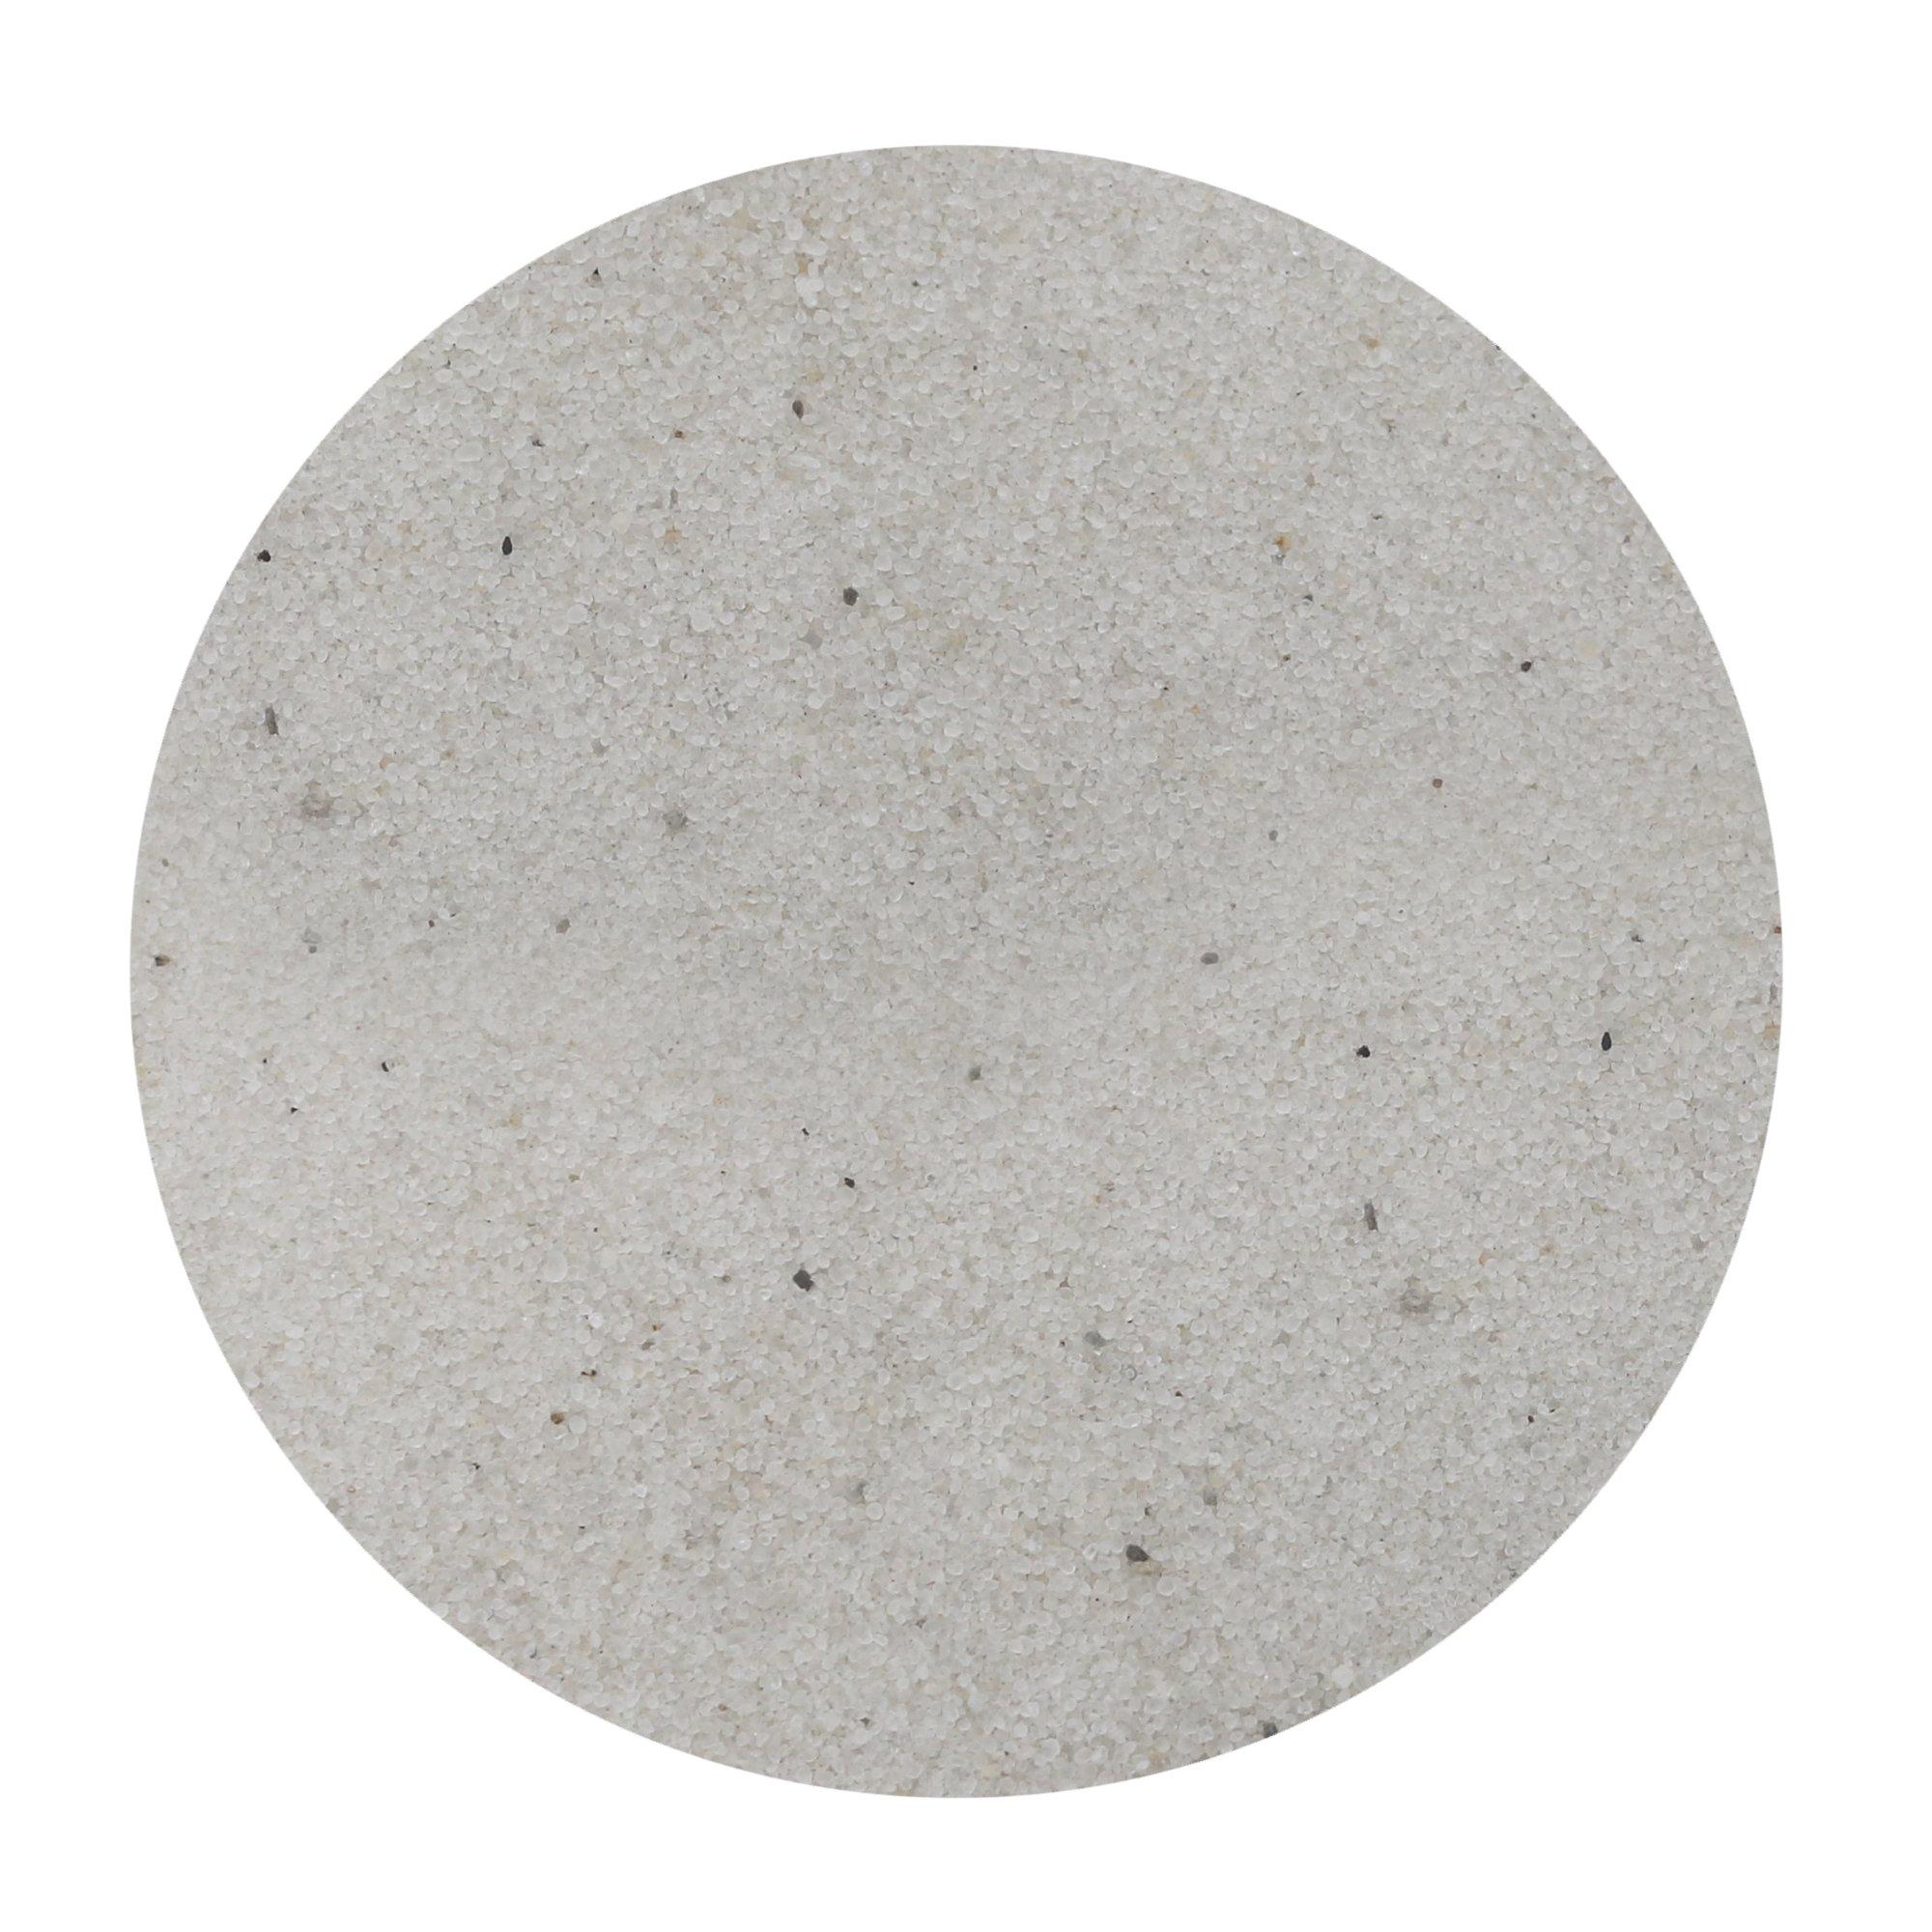 ACTIVA Scenic Sand, 5-Pound, White by Activa